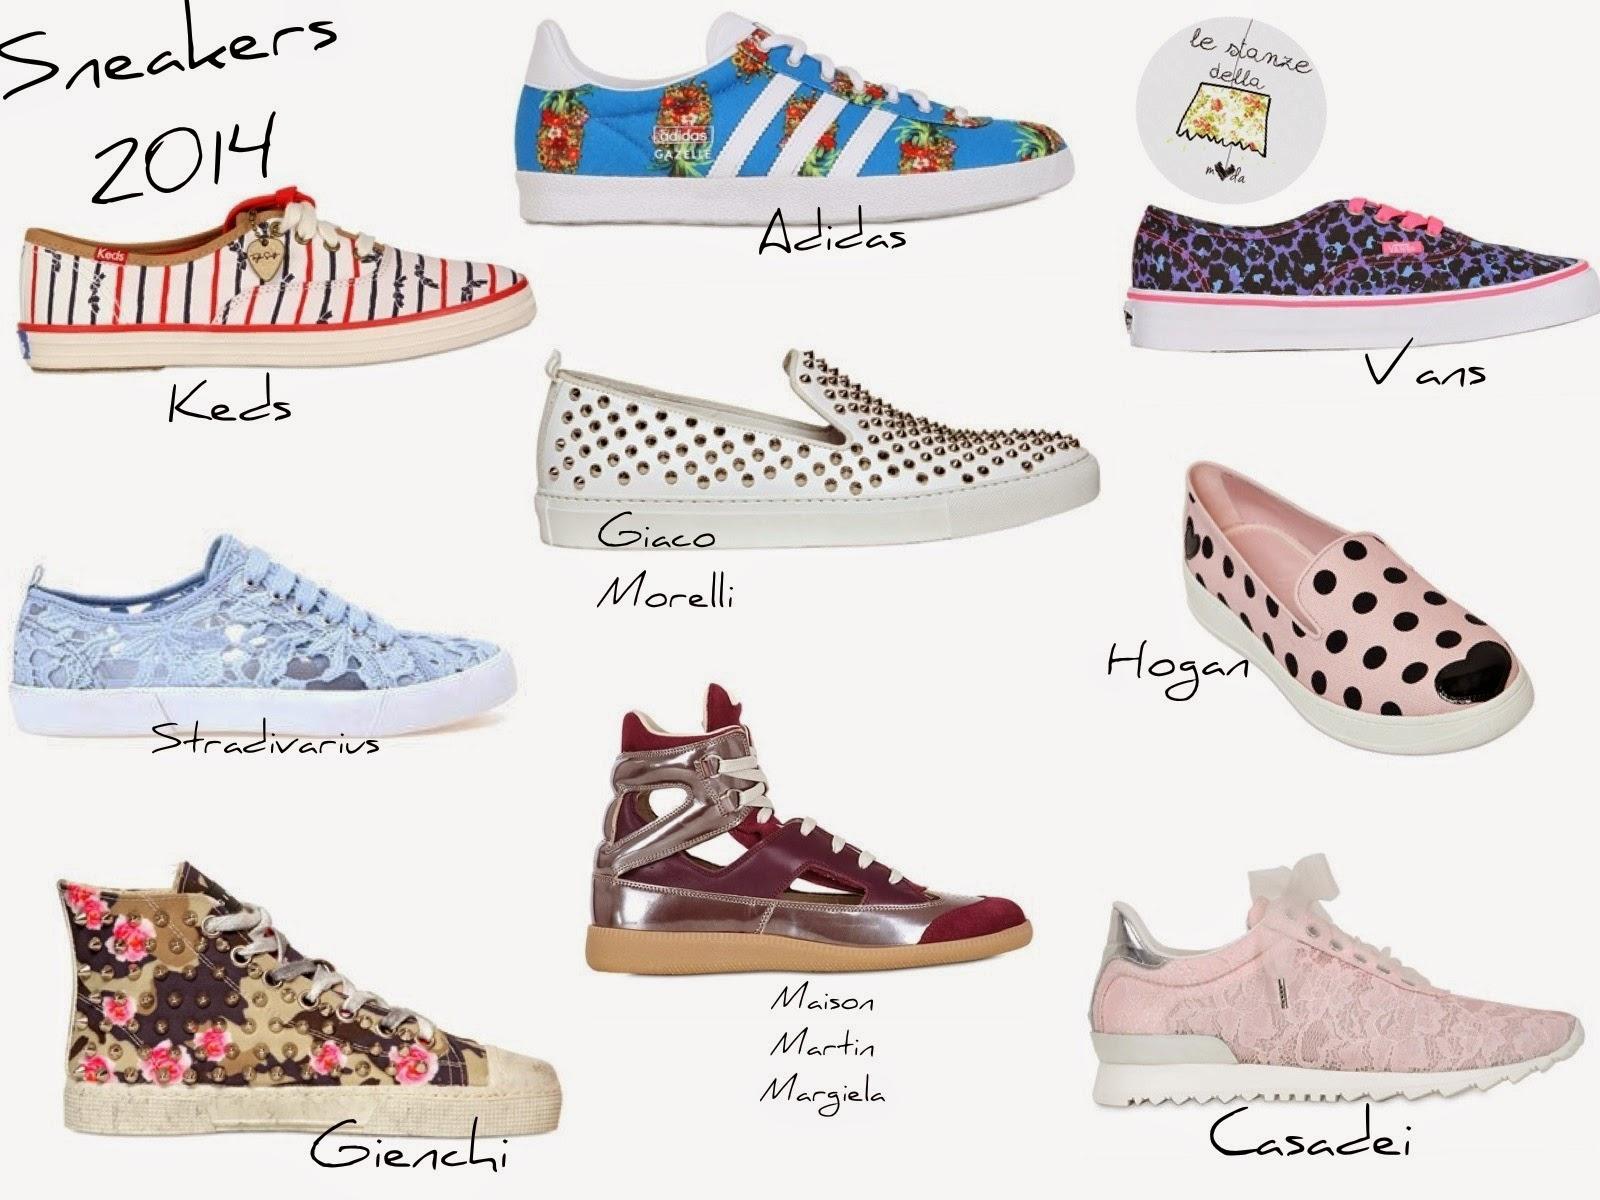 sneakers 2014, sneakers estate, scarpe 2014 estate, scarpe e scarpe